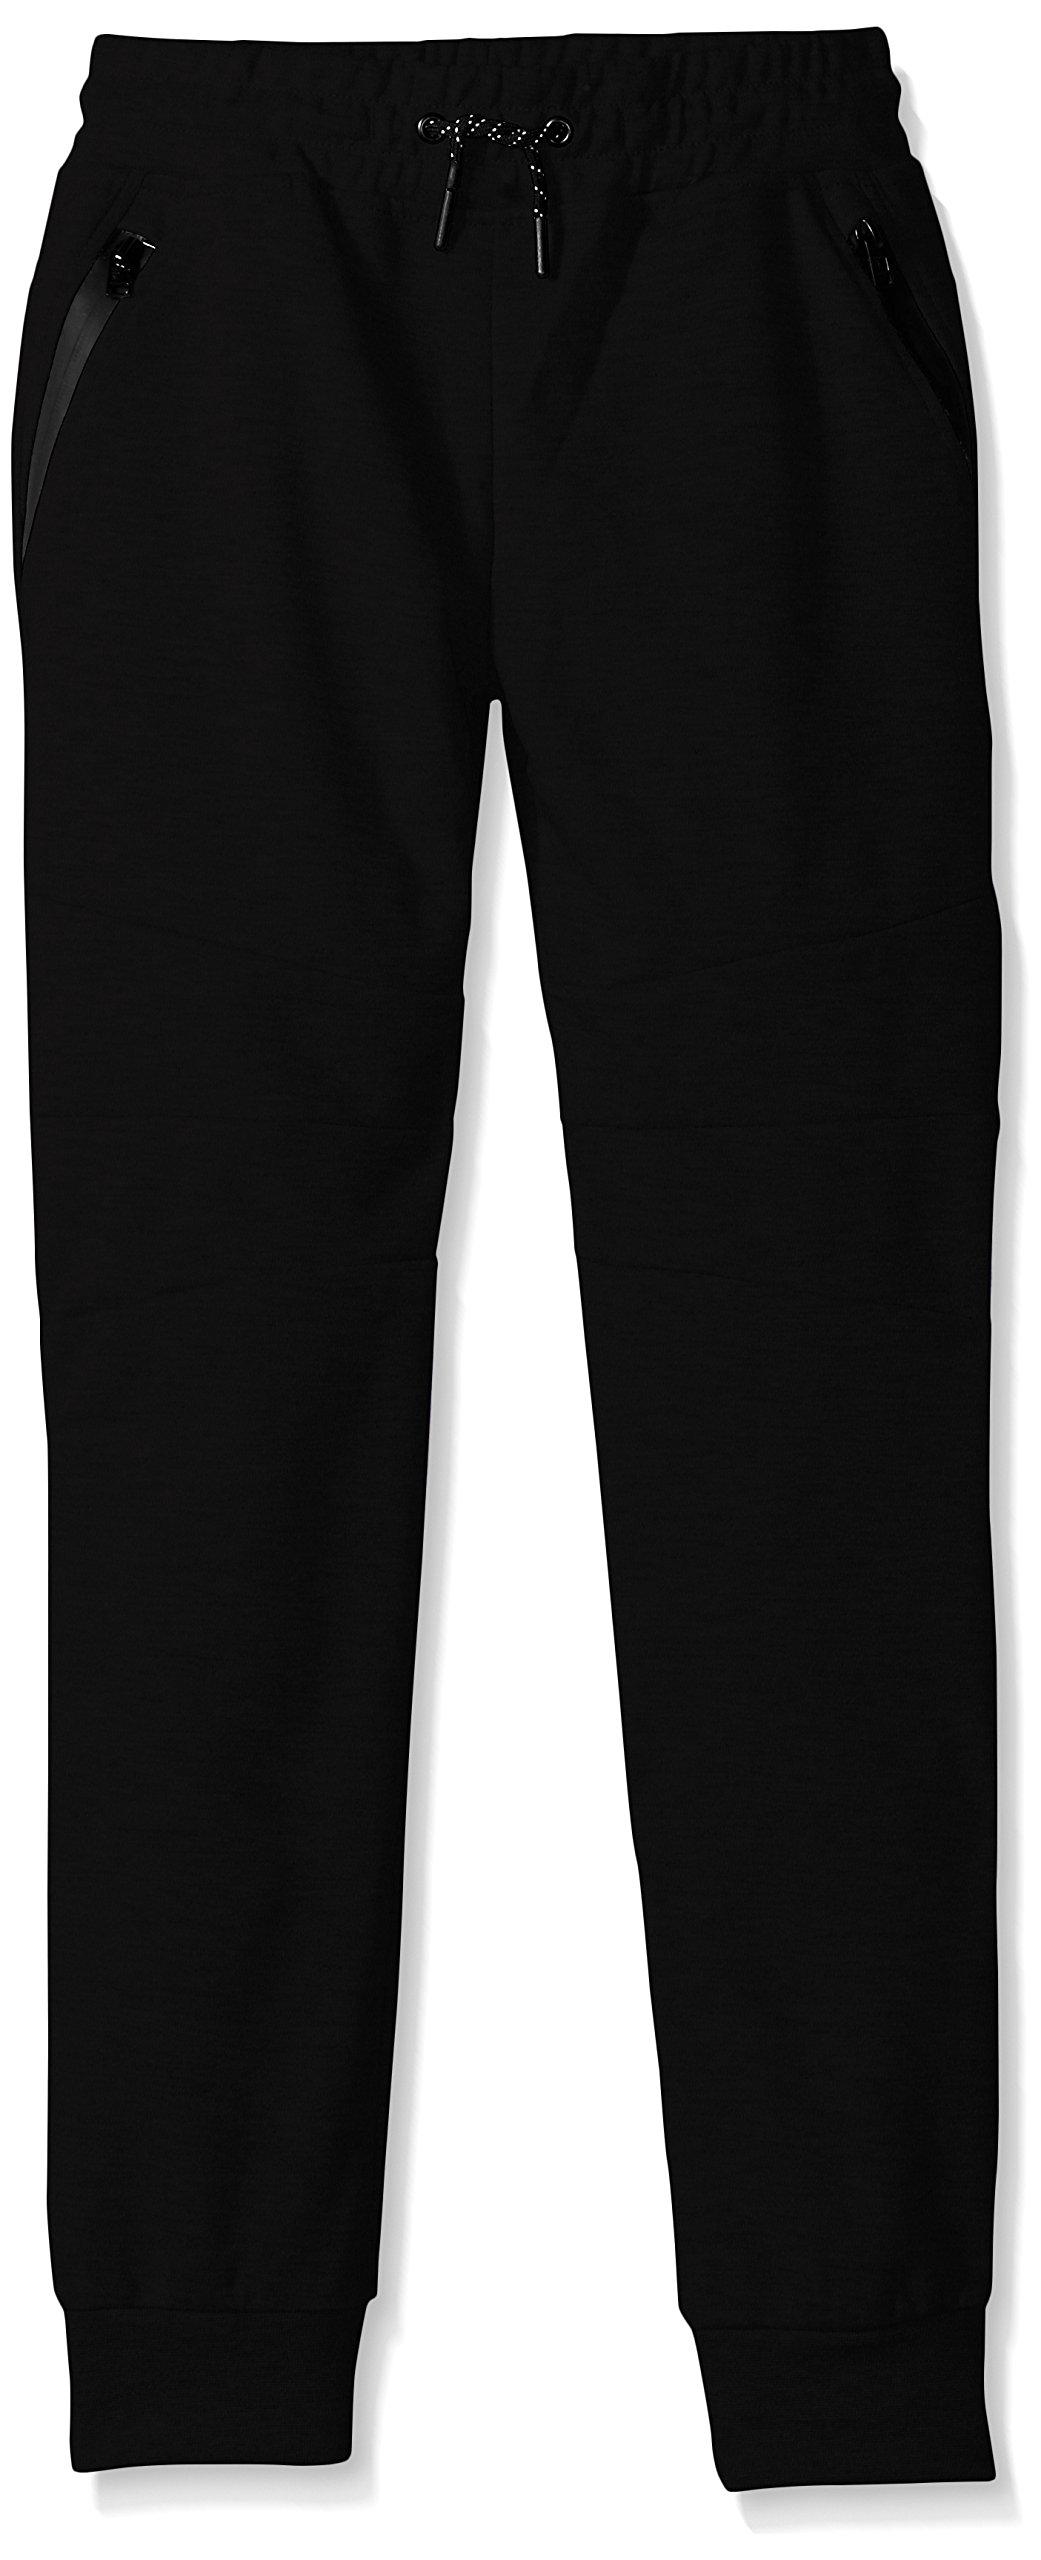 Southpole Big Boys' Tech Fleece Jogger Pants with Zipper Details, Black, Small